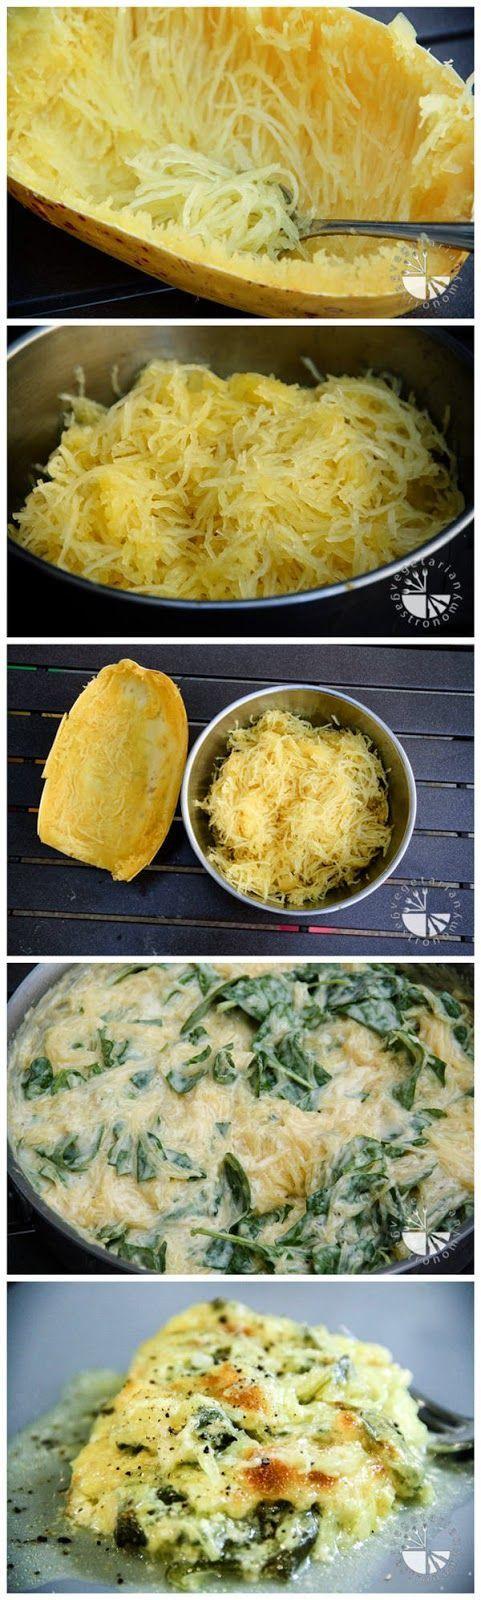 Baked Spaghetti Squash w/Cheddar Cheese & Spinach (sub corn starch for flour) [ SkinnyFoxDetox.com ]